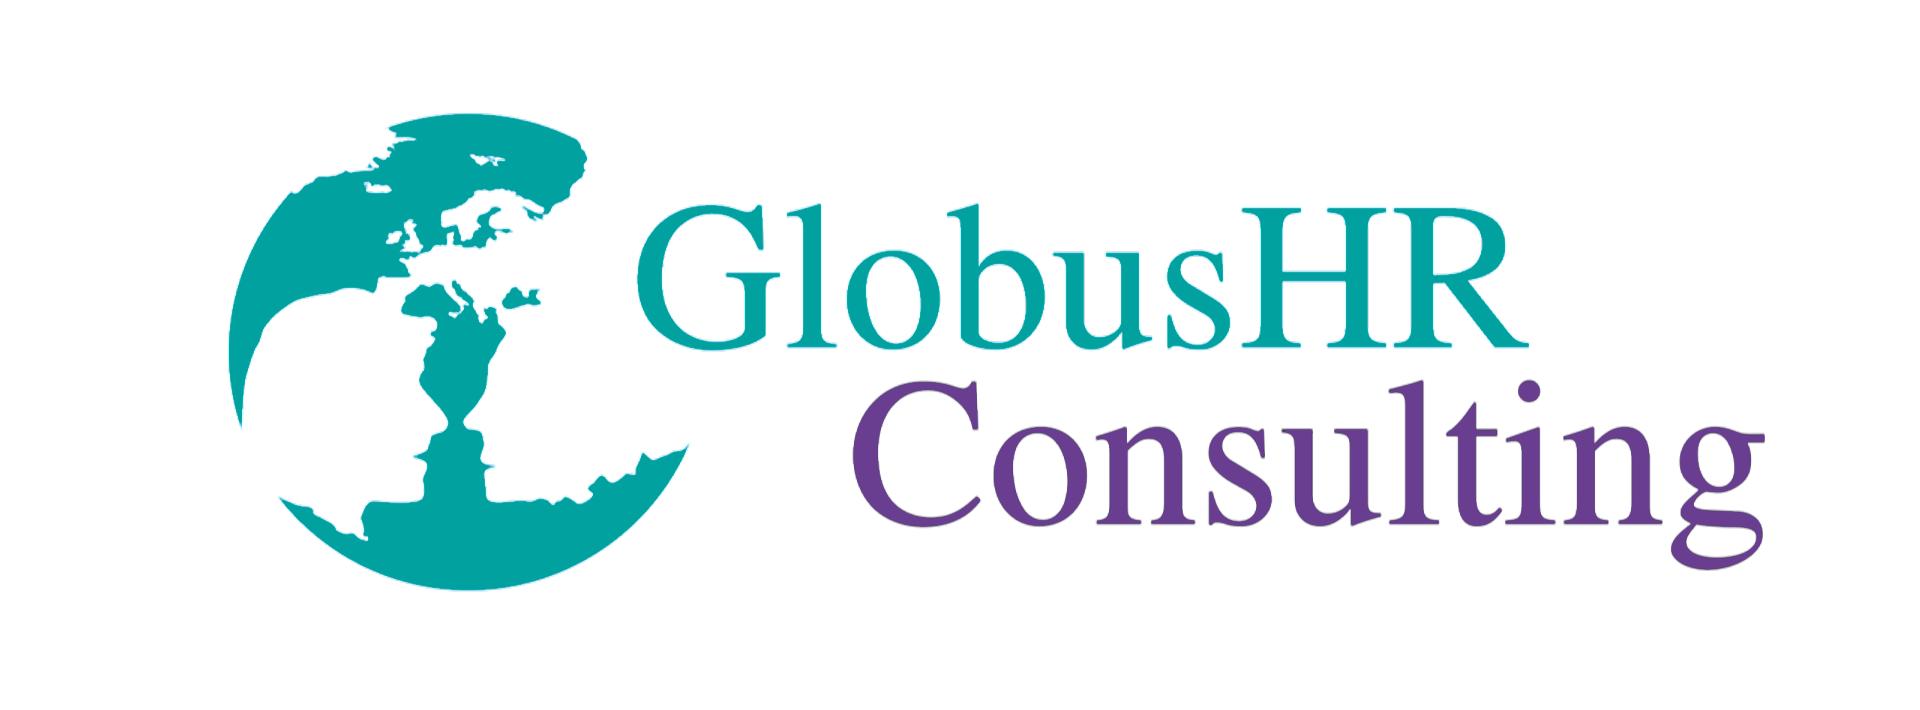 Globus HR logo new colours white